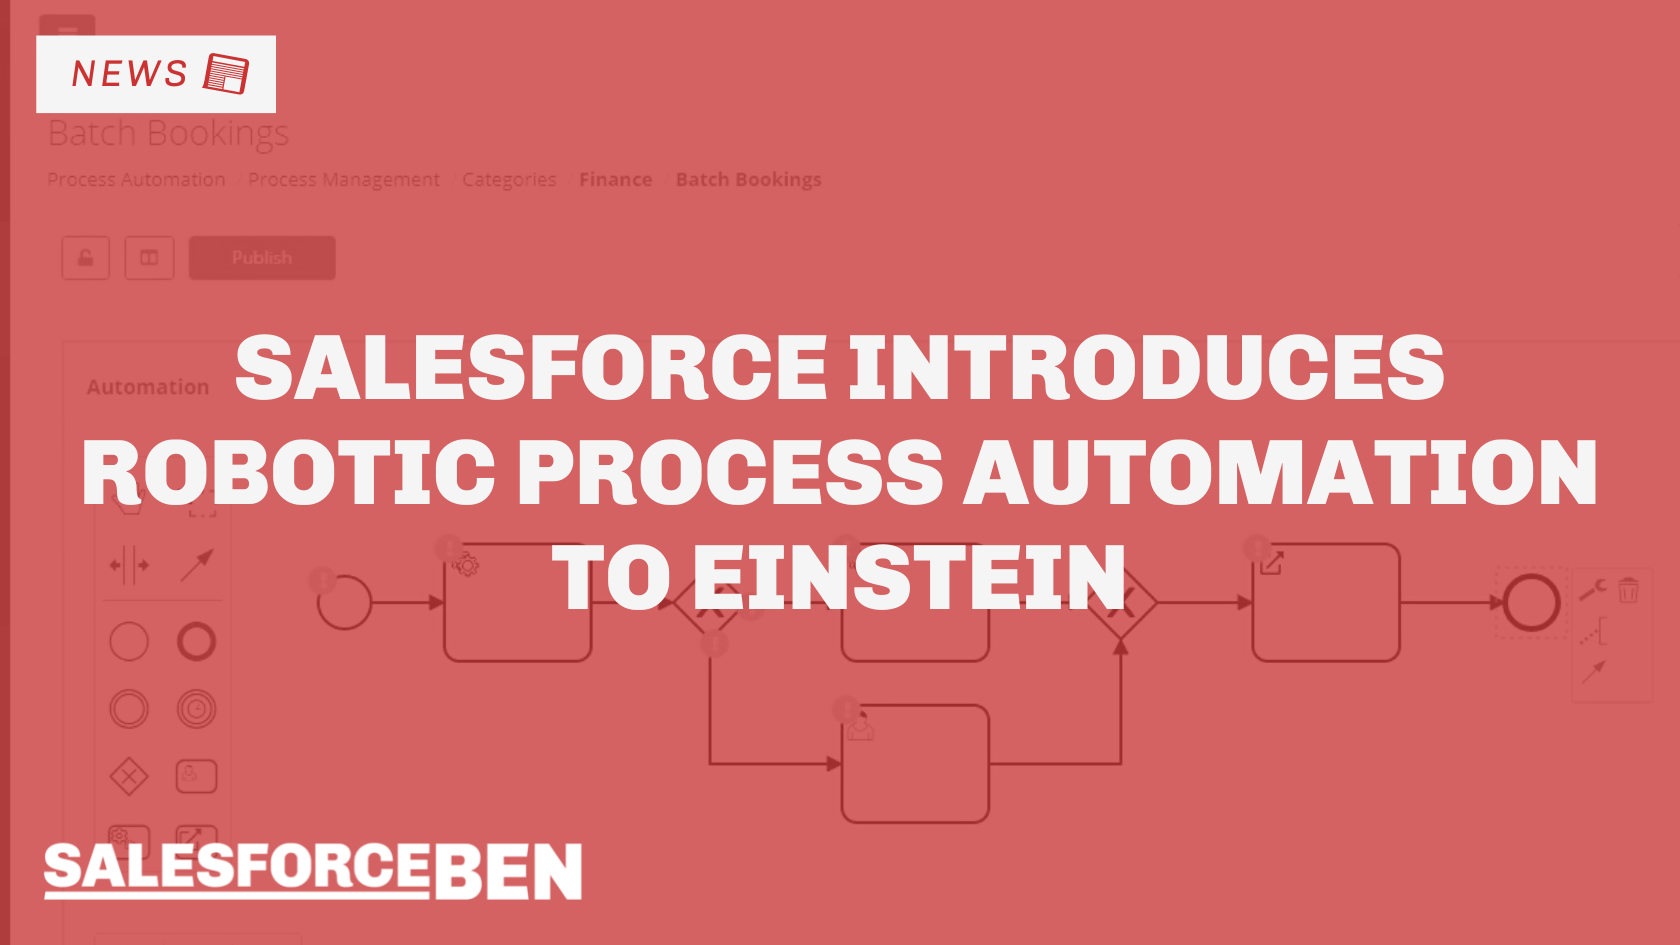 Salesforce Introduces Robotic Process Automation to Einstein